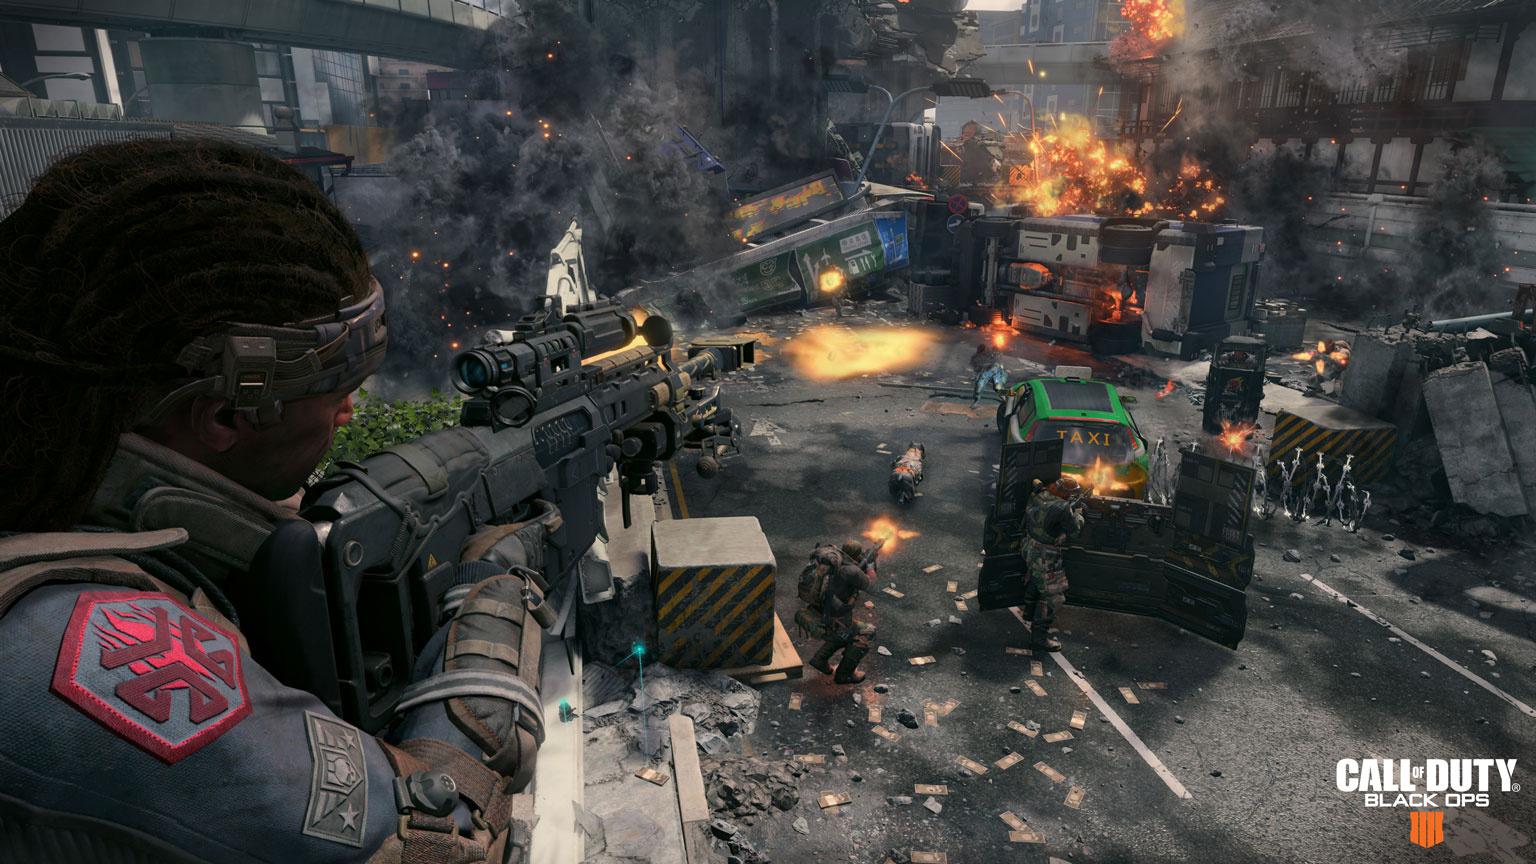 Call of Duty Black Ops 4 | ShopTo net